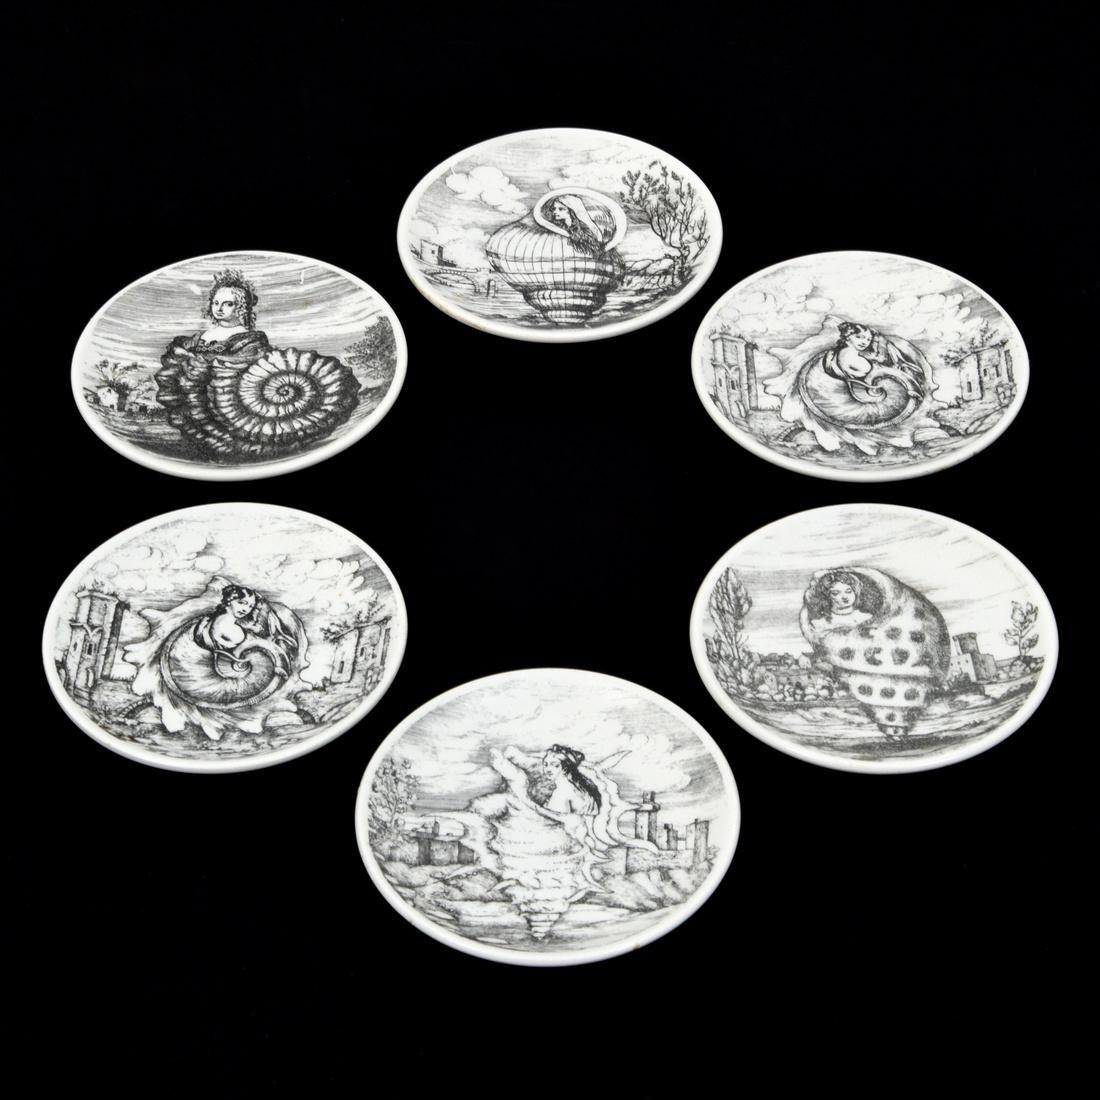 Piero Fornasetti LE OCEANIDI Coasters, Set of 6